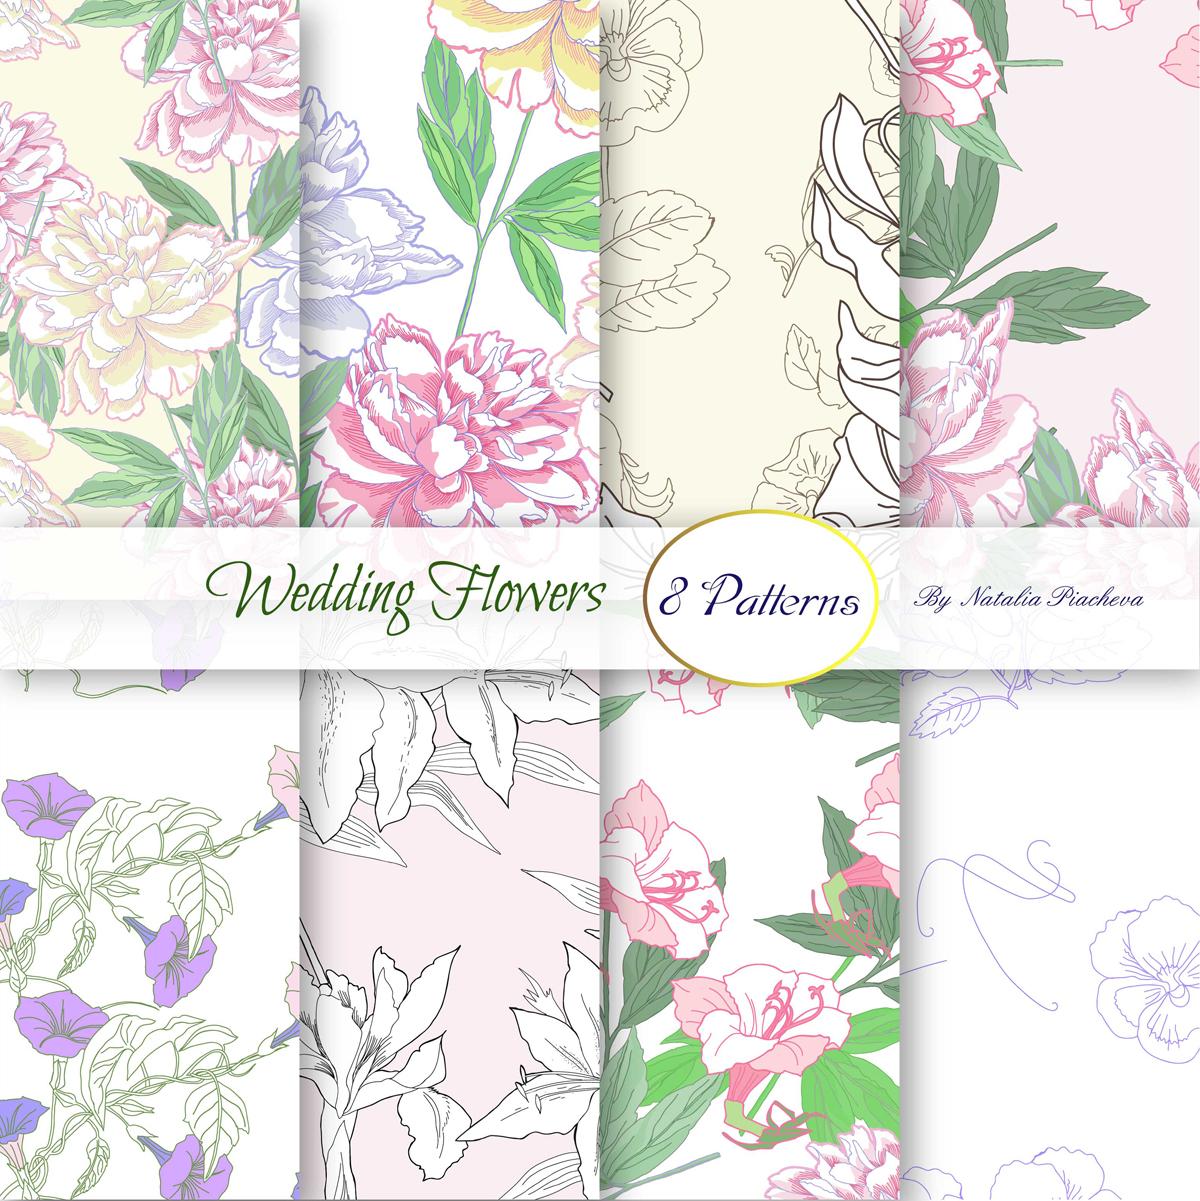 Wedding Flowers.Digital Paper example image 1